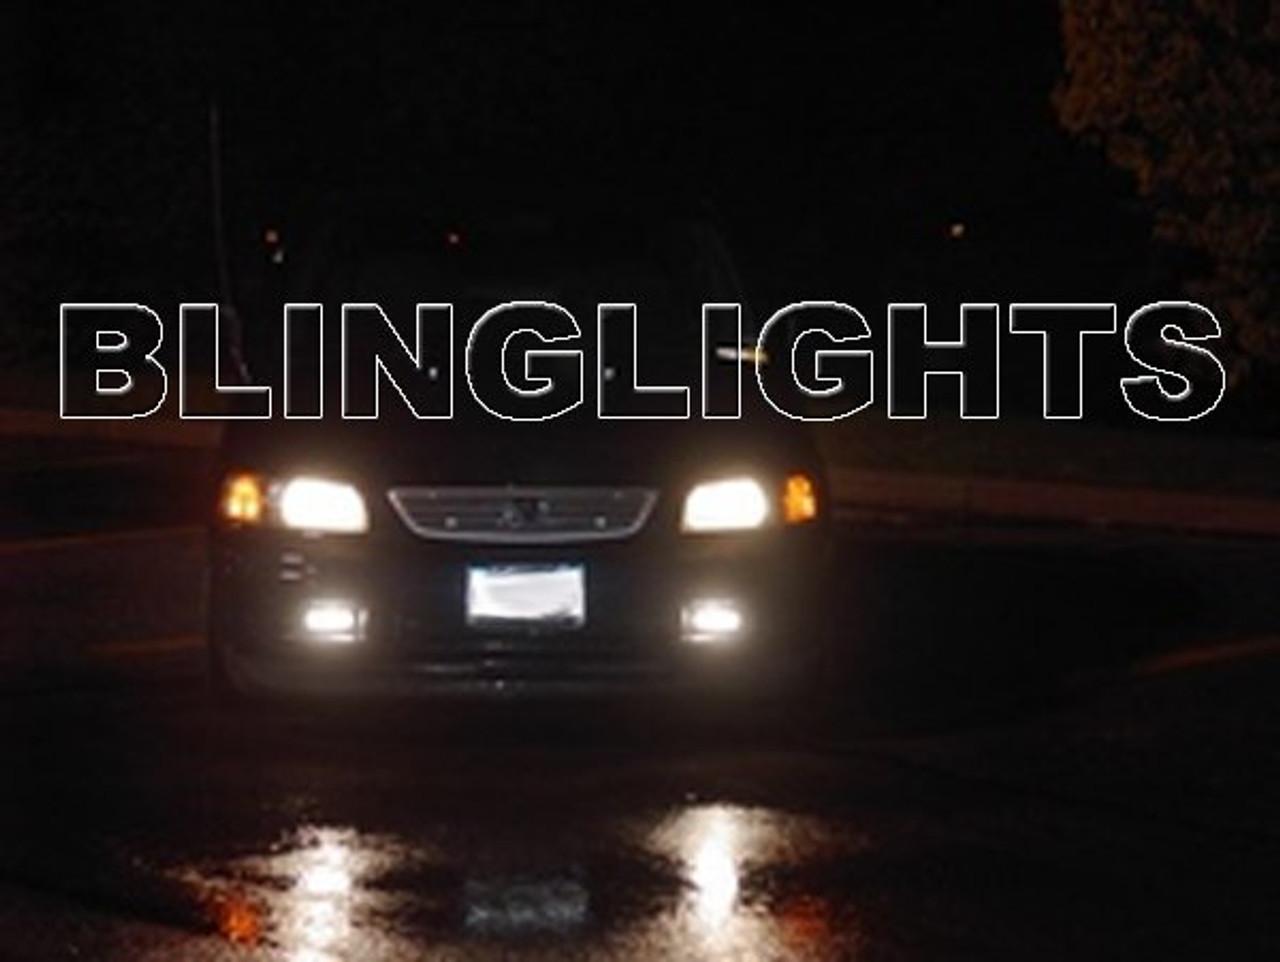 1994 1995 1996 1997 1998 Honda Odyssey Xenon Fog Lamps Driving Lights Foglamps Foglights Kit